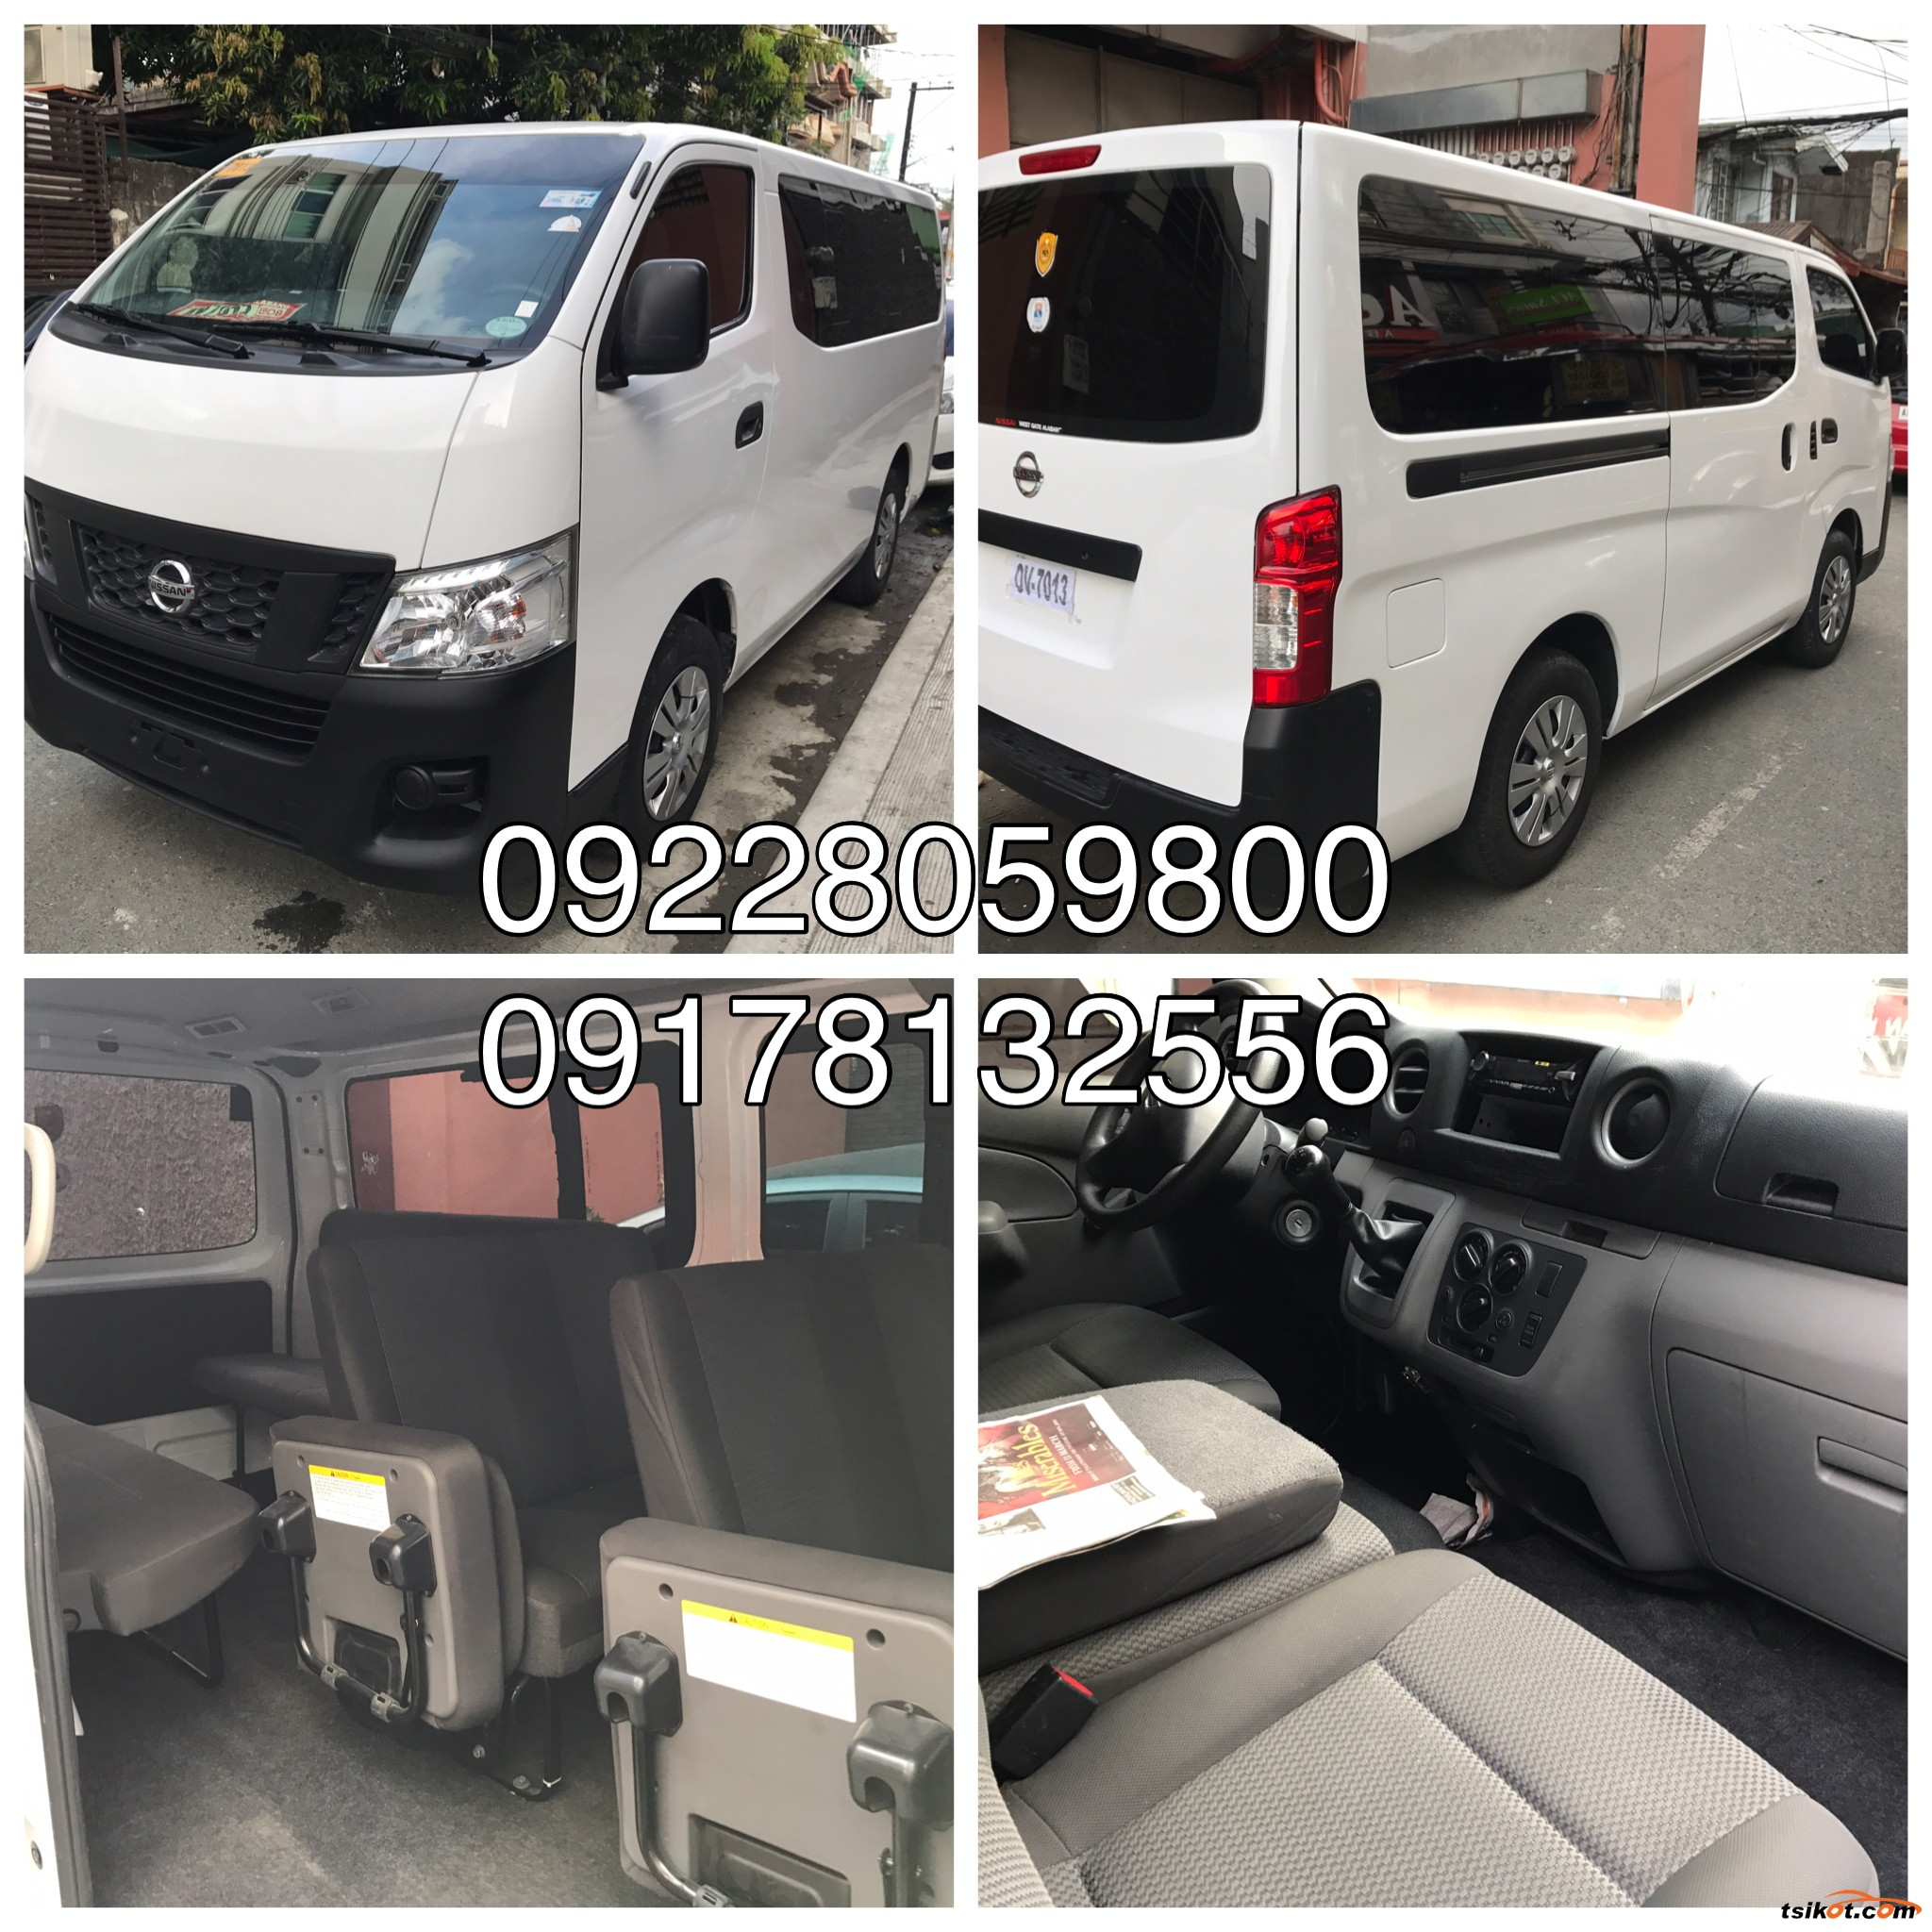 2016 Nissan Nv3500 Hd Passenger Exterior: Car For Sale Metro Manila